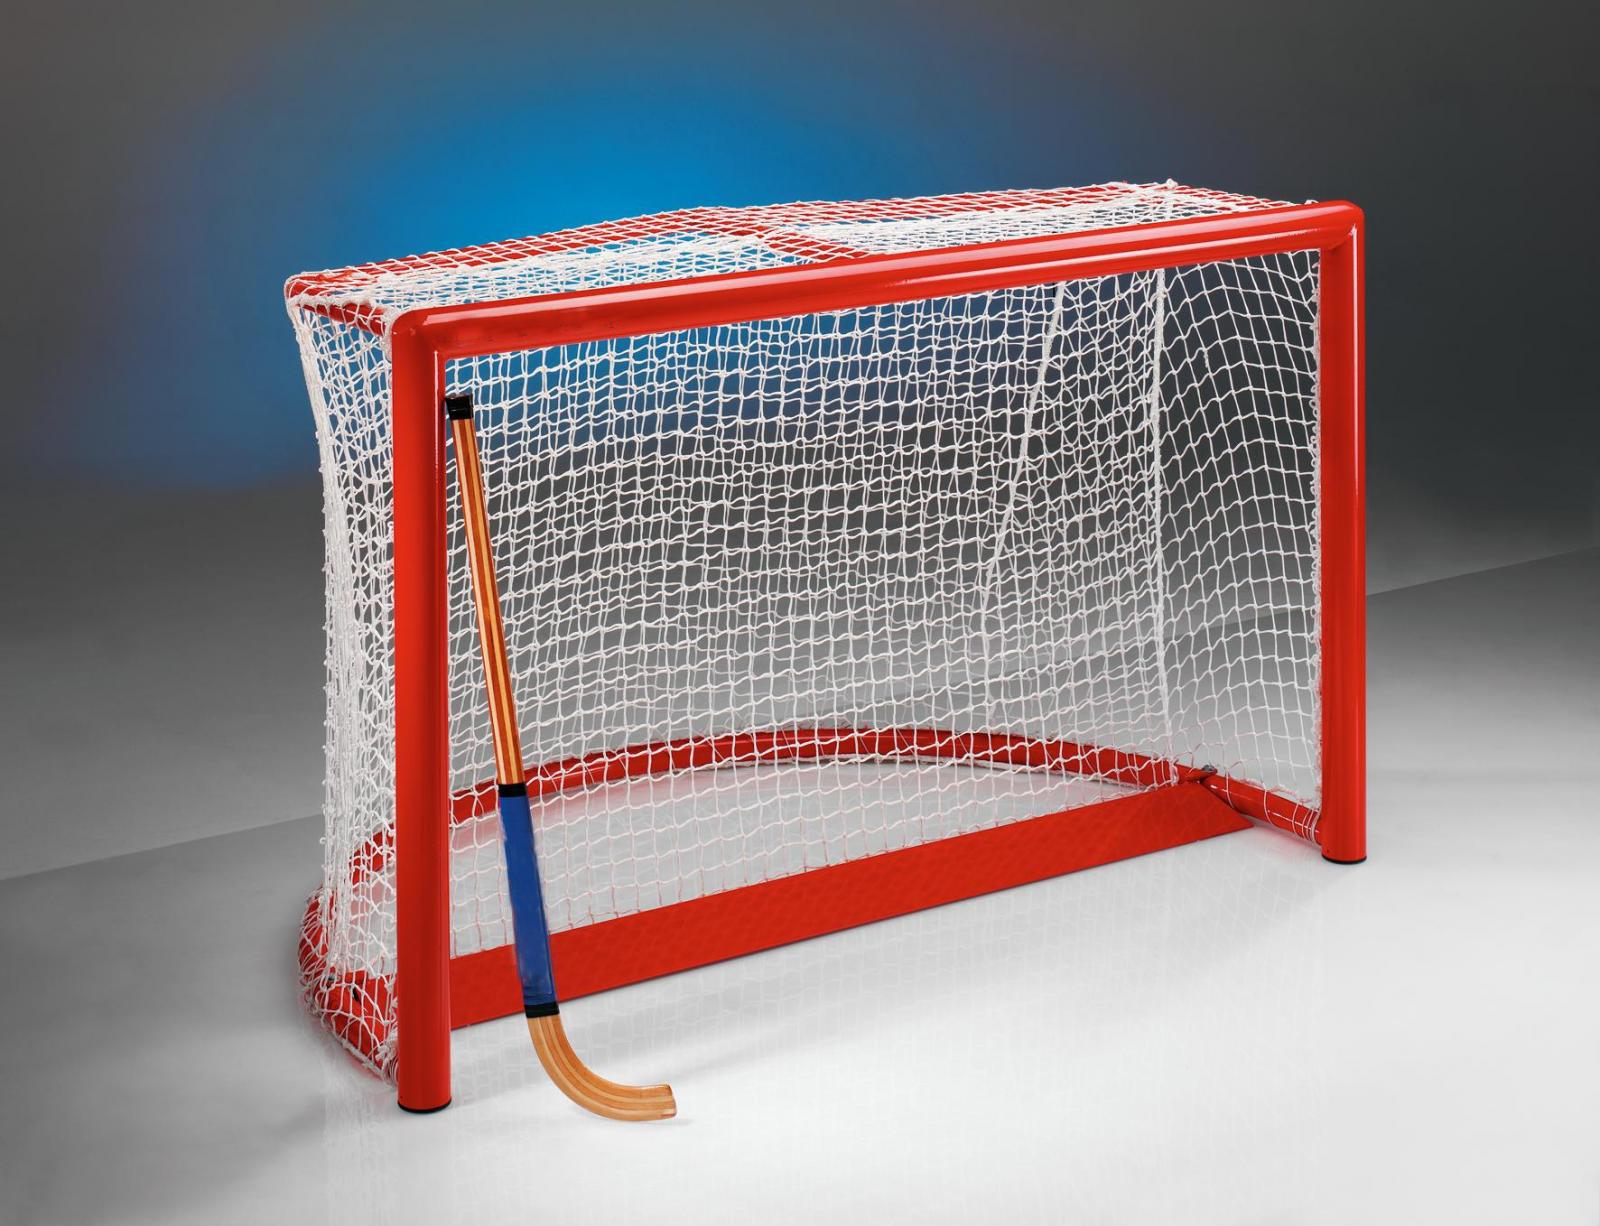 Image of   Roller Hockey Goal - med top og bund del - 76 mm i diameter